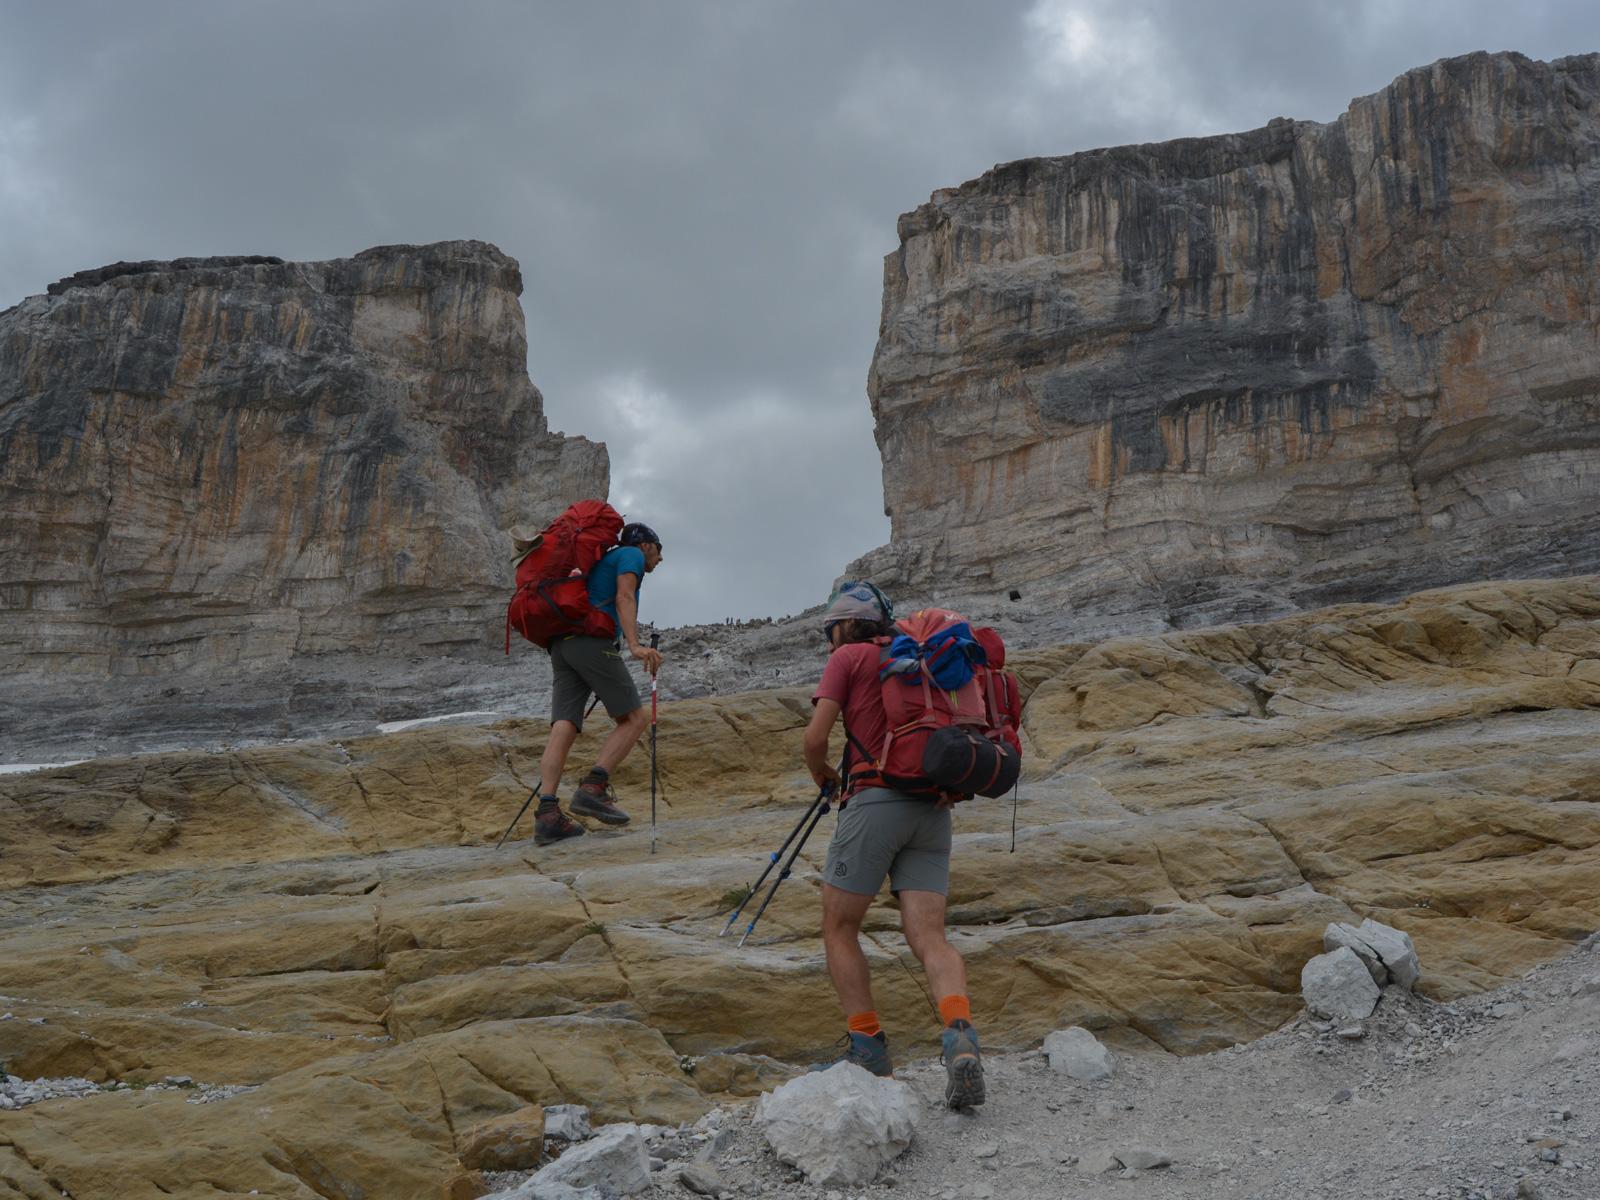 Monte Perdido et Faja de las Flores, Jour 1, Ordesa, Aragon, Espagne 18